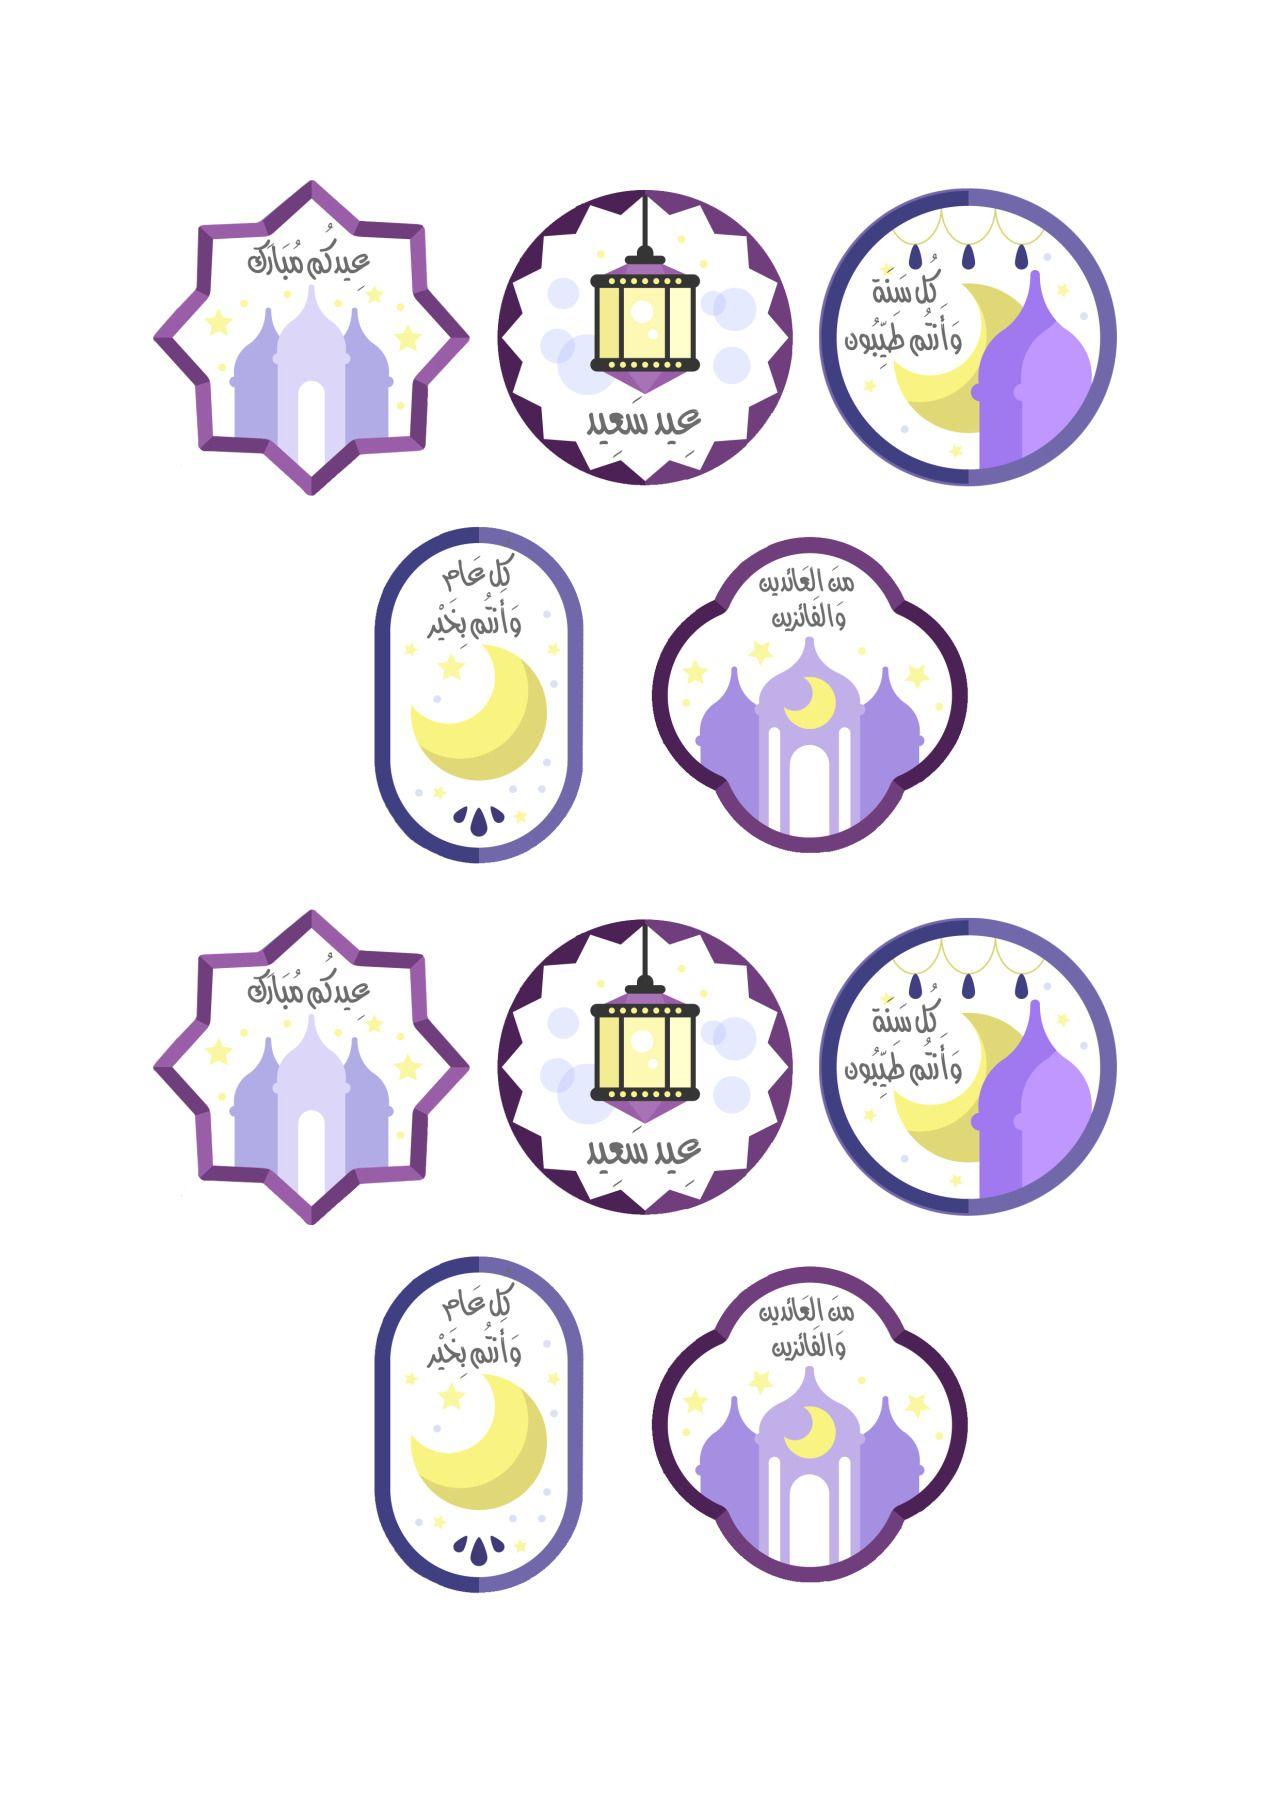 Ideas For Eid أفكار ومطبوعات للعيد Eid Stickers Eid Cards Ramadan Crafts